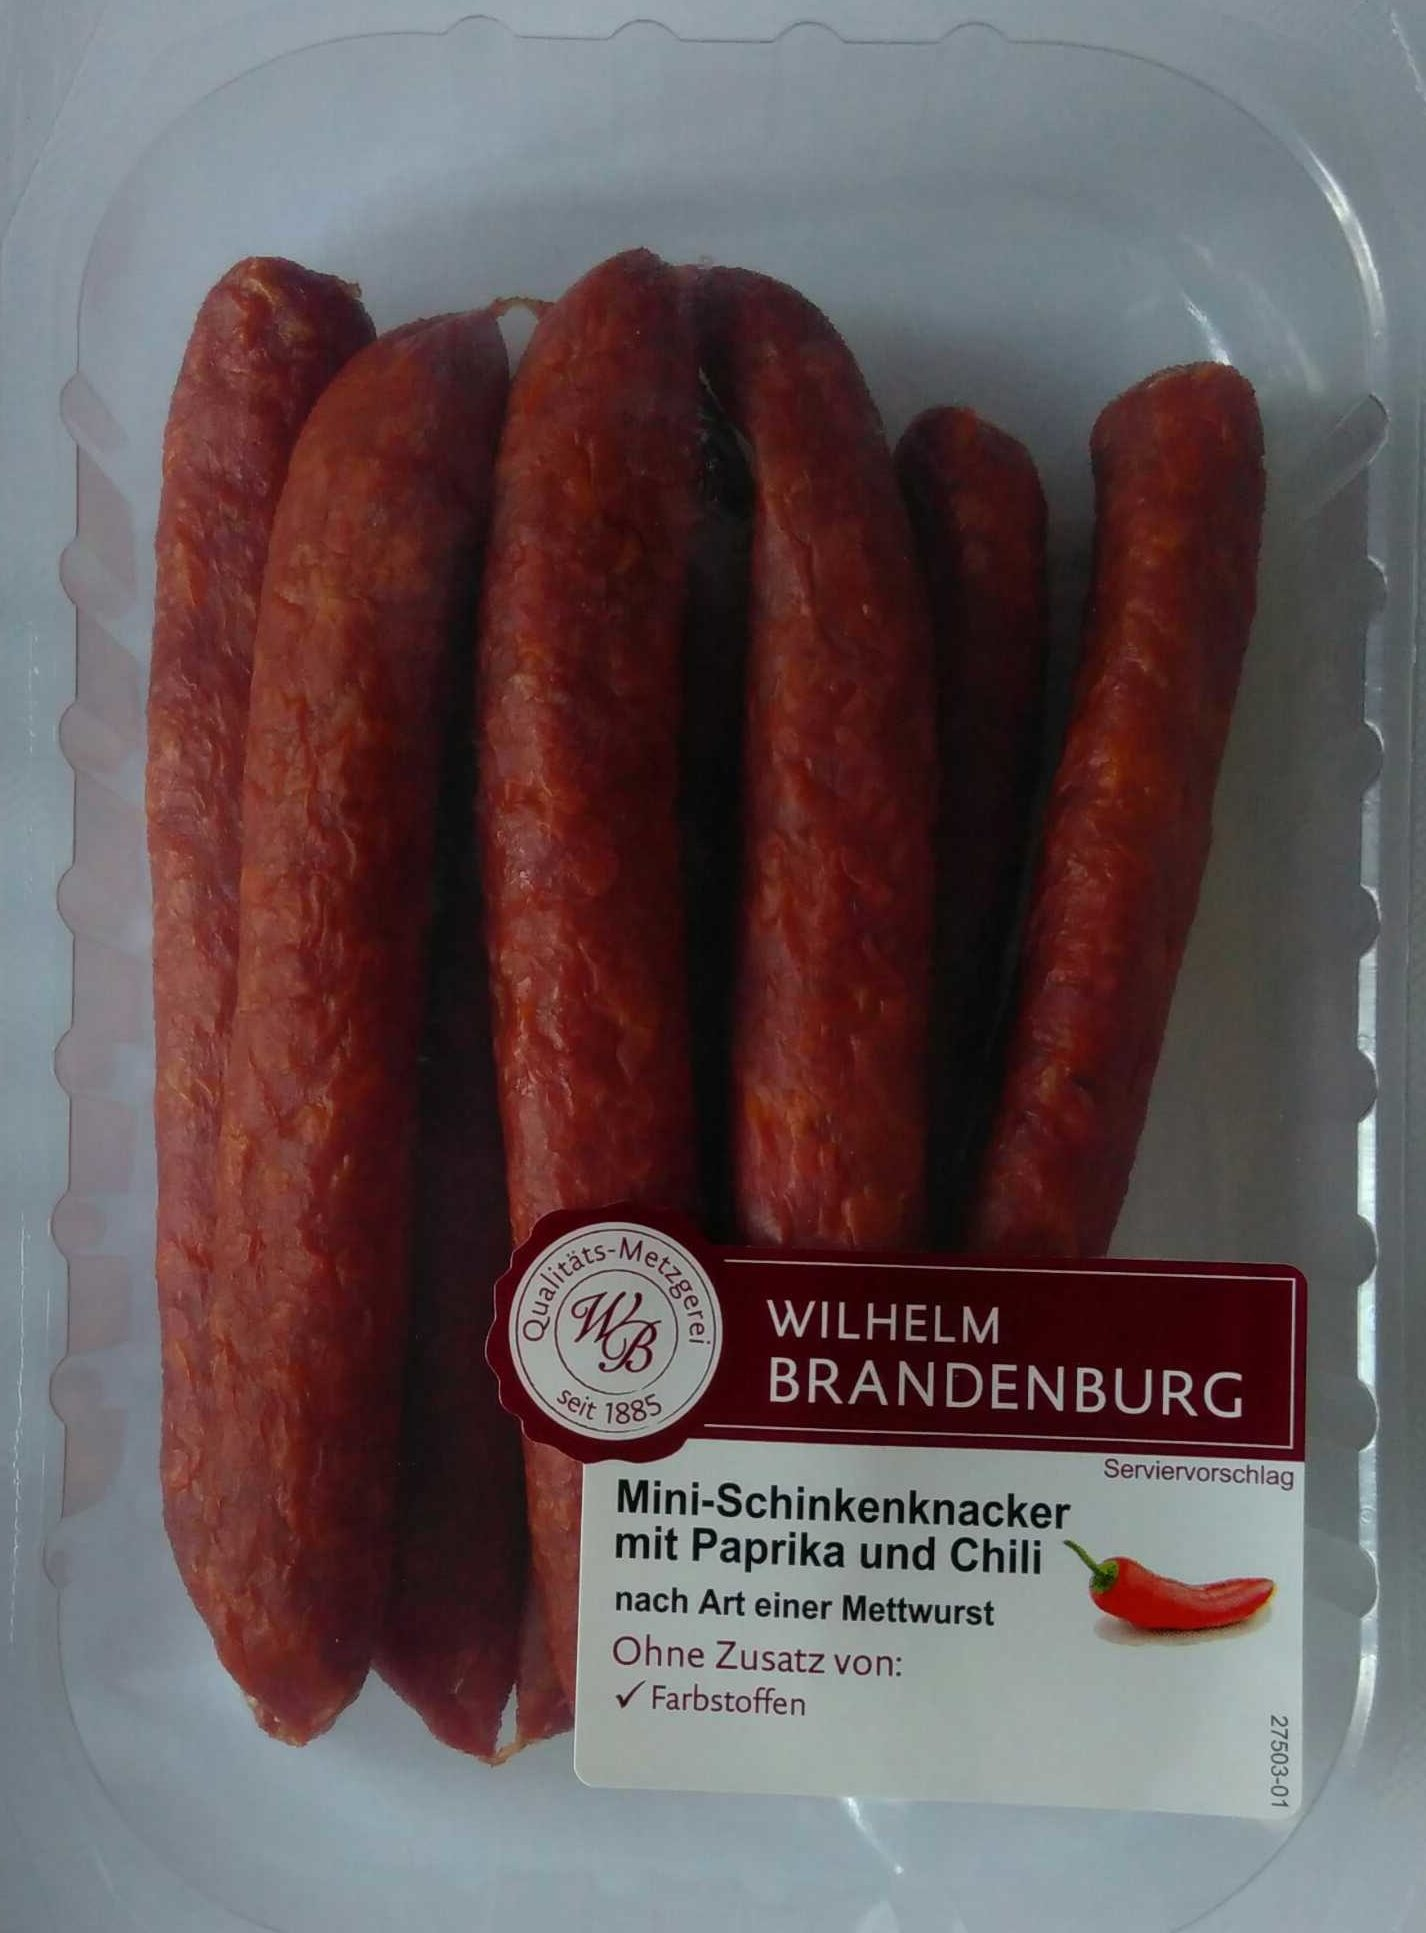 Mini-Schinkenknacker mit Paprika und Chili - Product - de